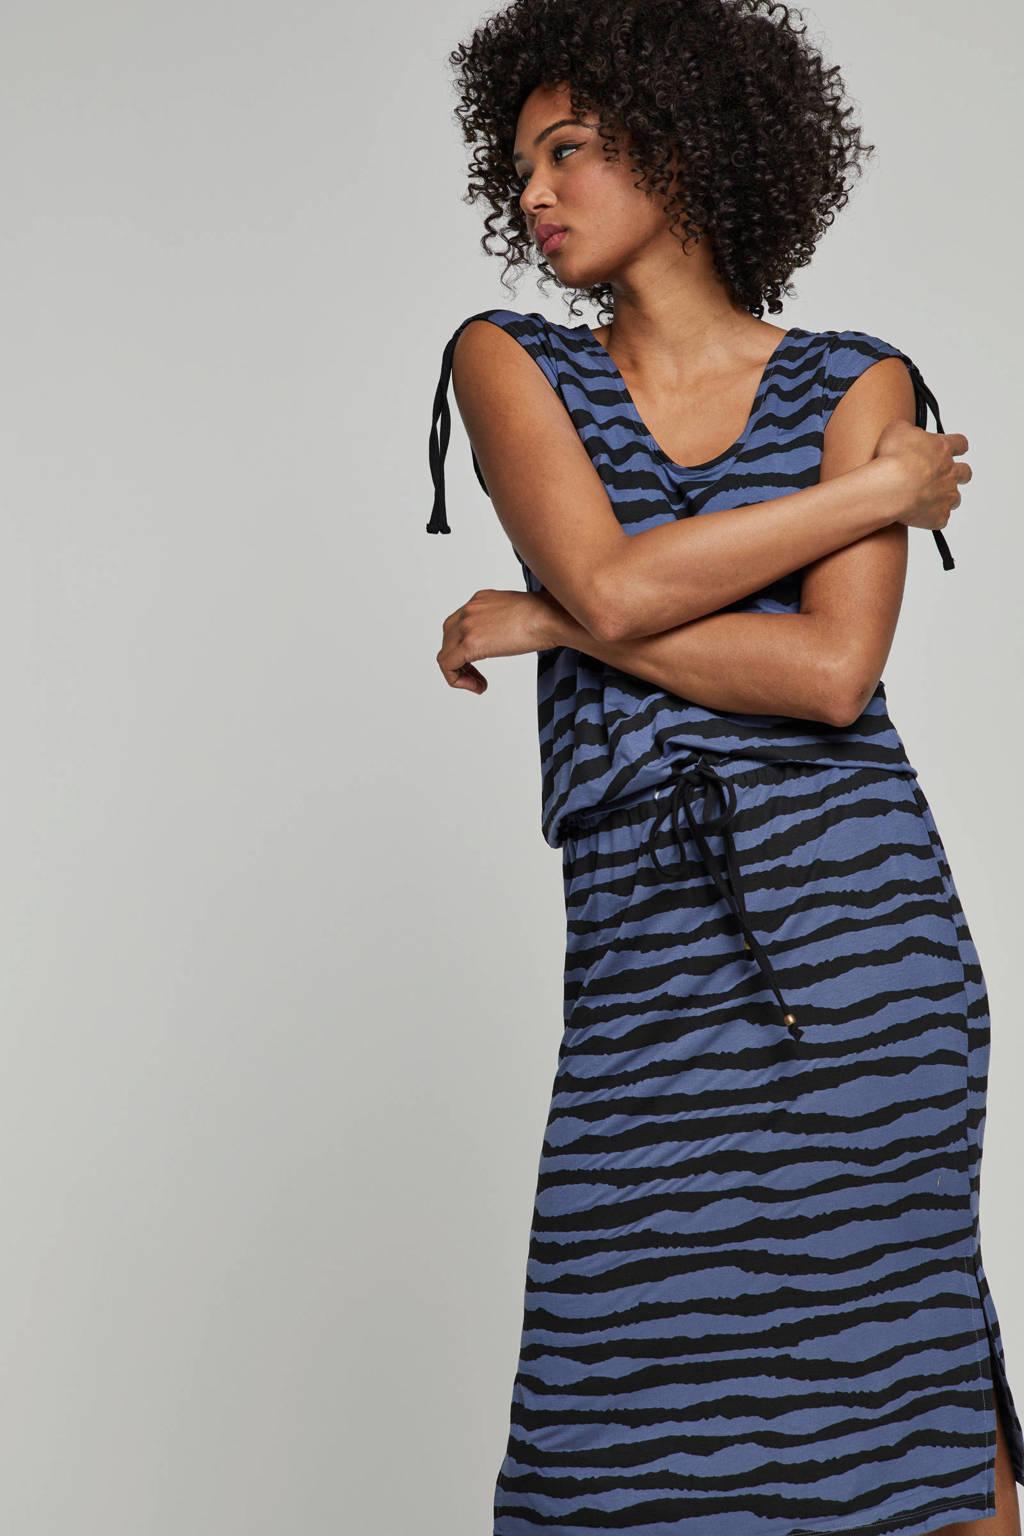 whkmp's beachwave viscose jurk met zebraprint, Zwart/blauw